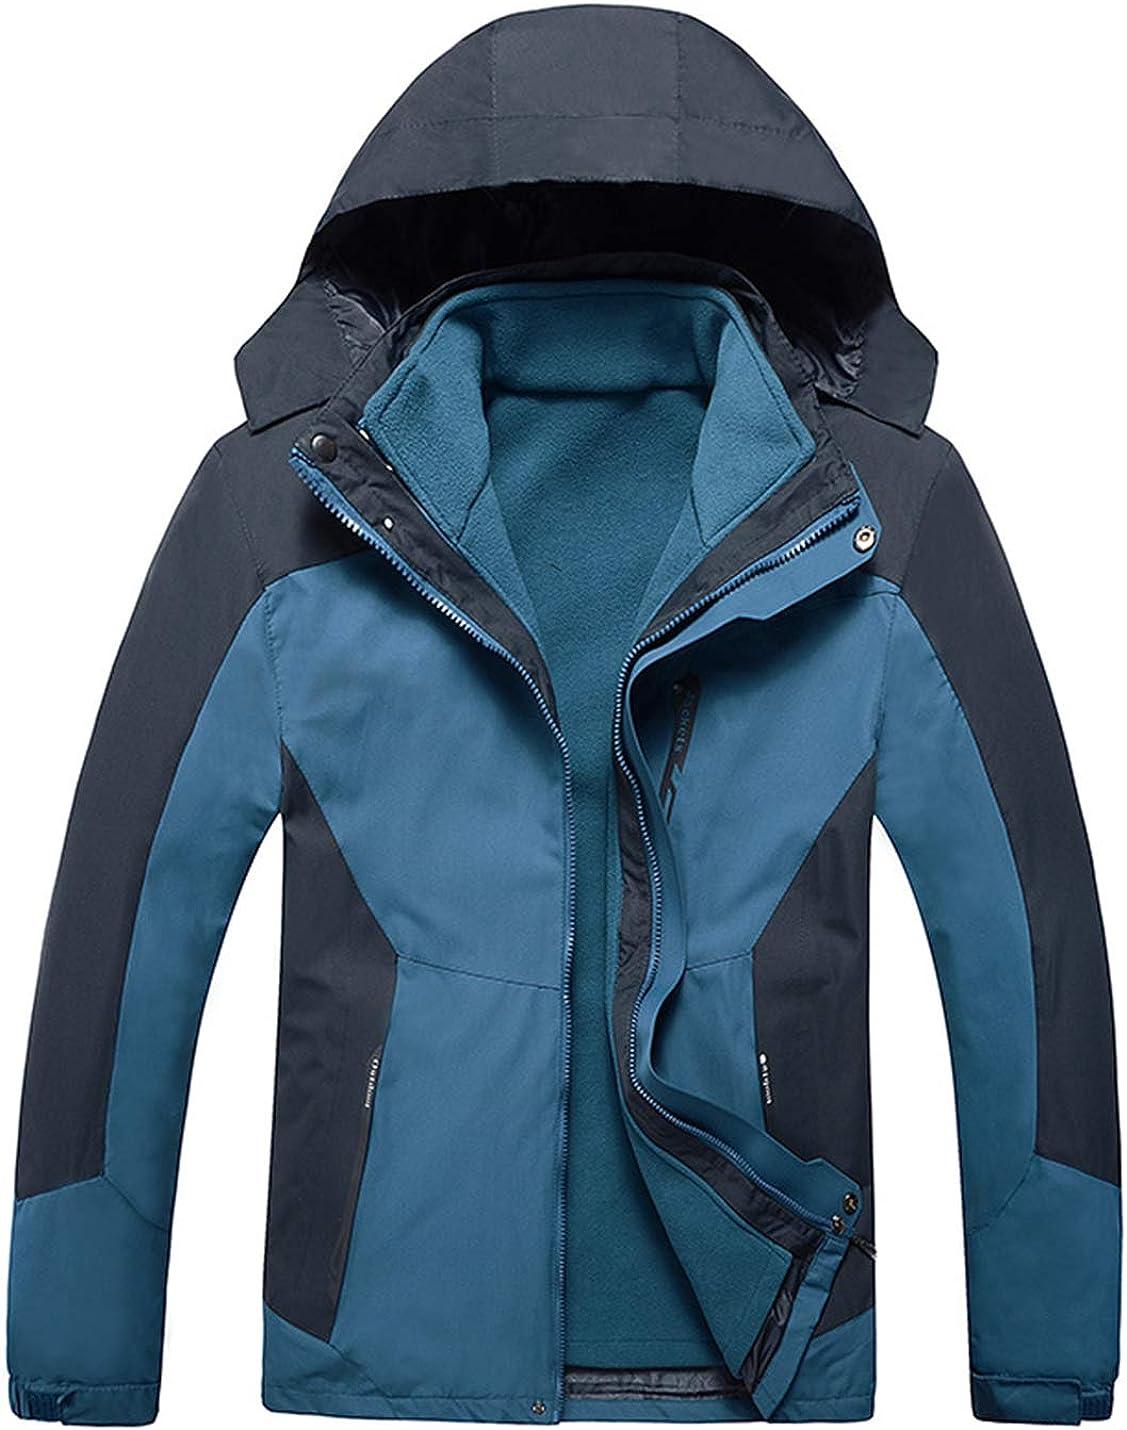 Uaneo Mens Casual Detachable Hood Waterproof Fleece Lined Outdoor Mountain Jackets(DarkBlue-L)